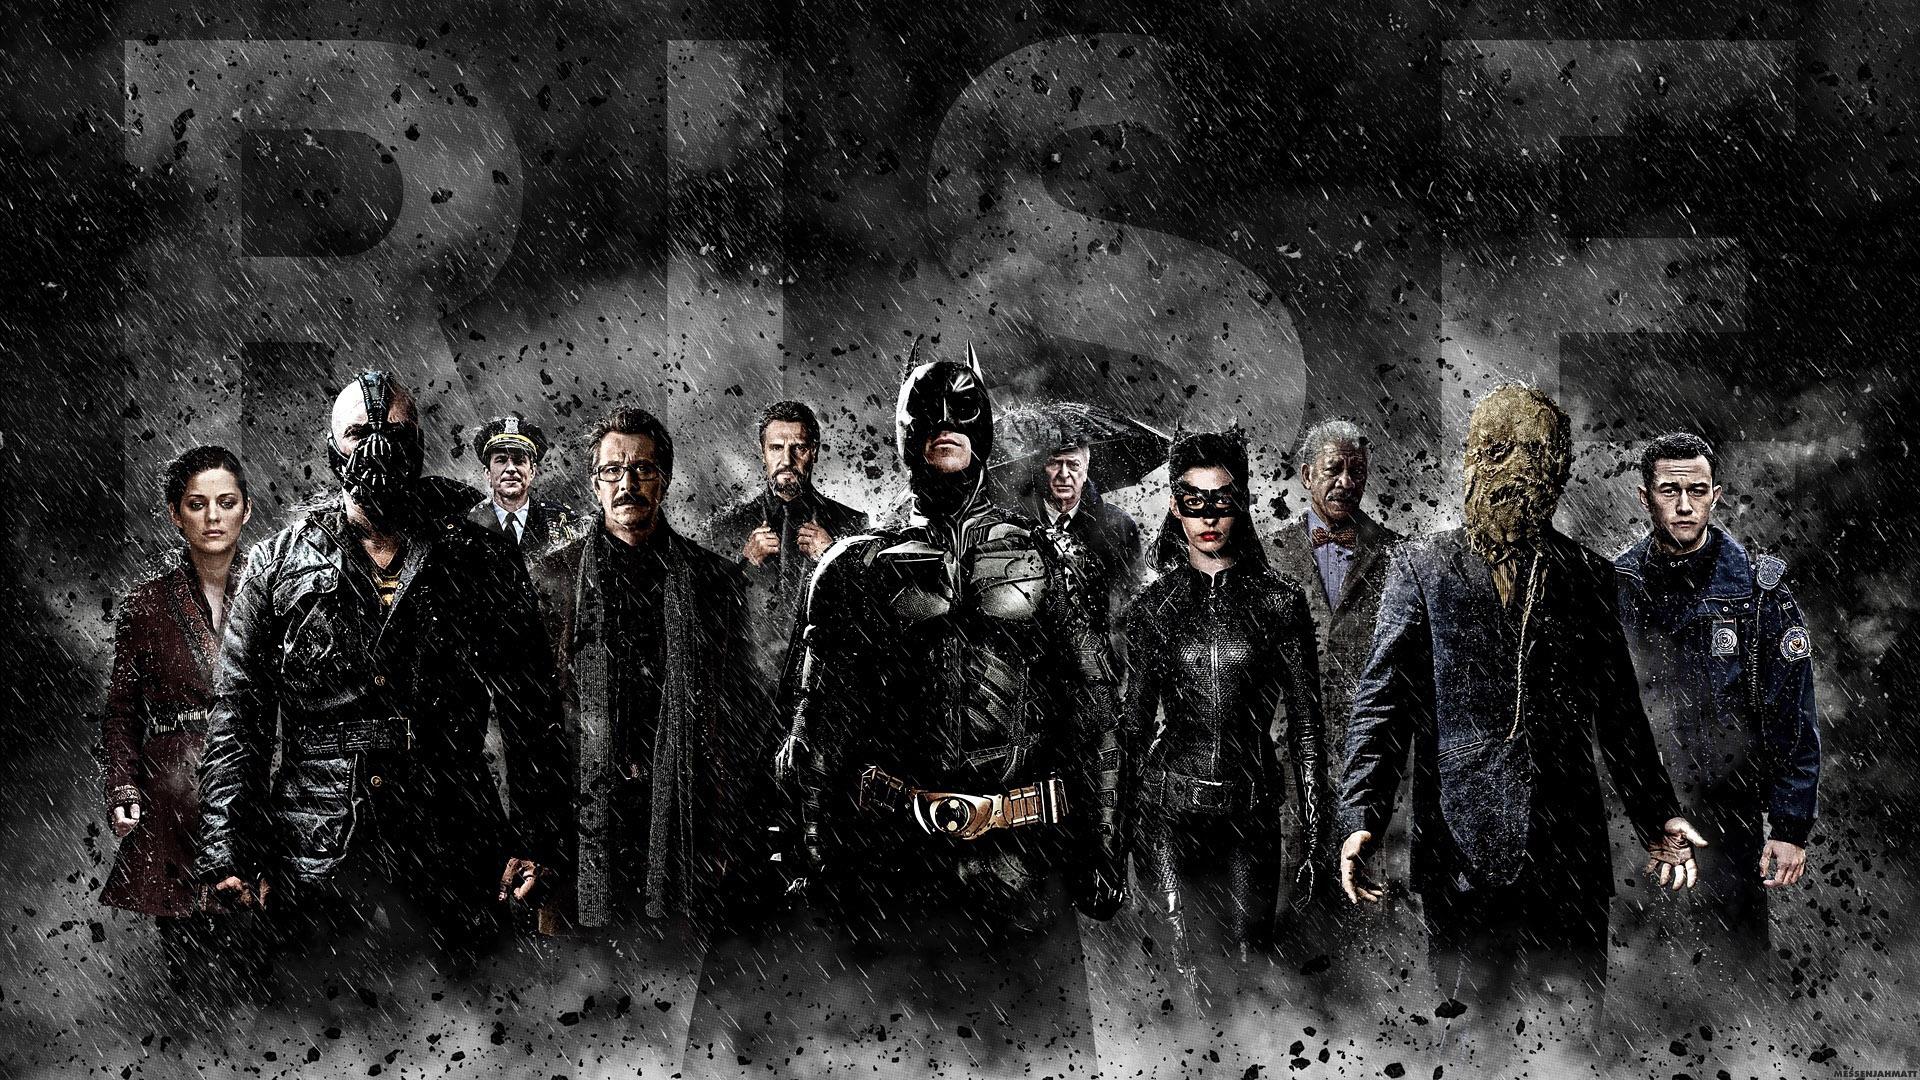 Batman Hd Wallpapers 1080p Batman Backgrounds New Free Download Pixelstalk Net